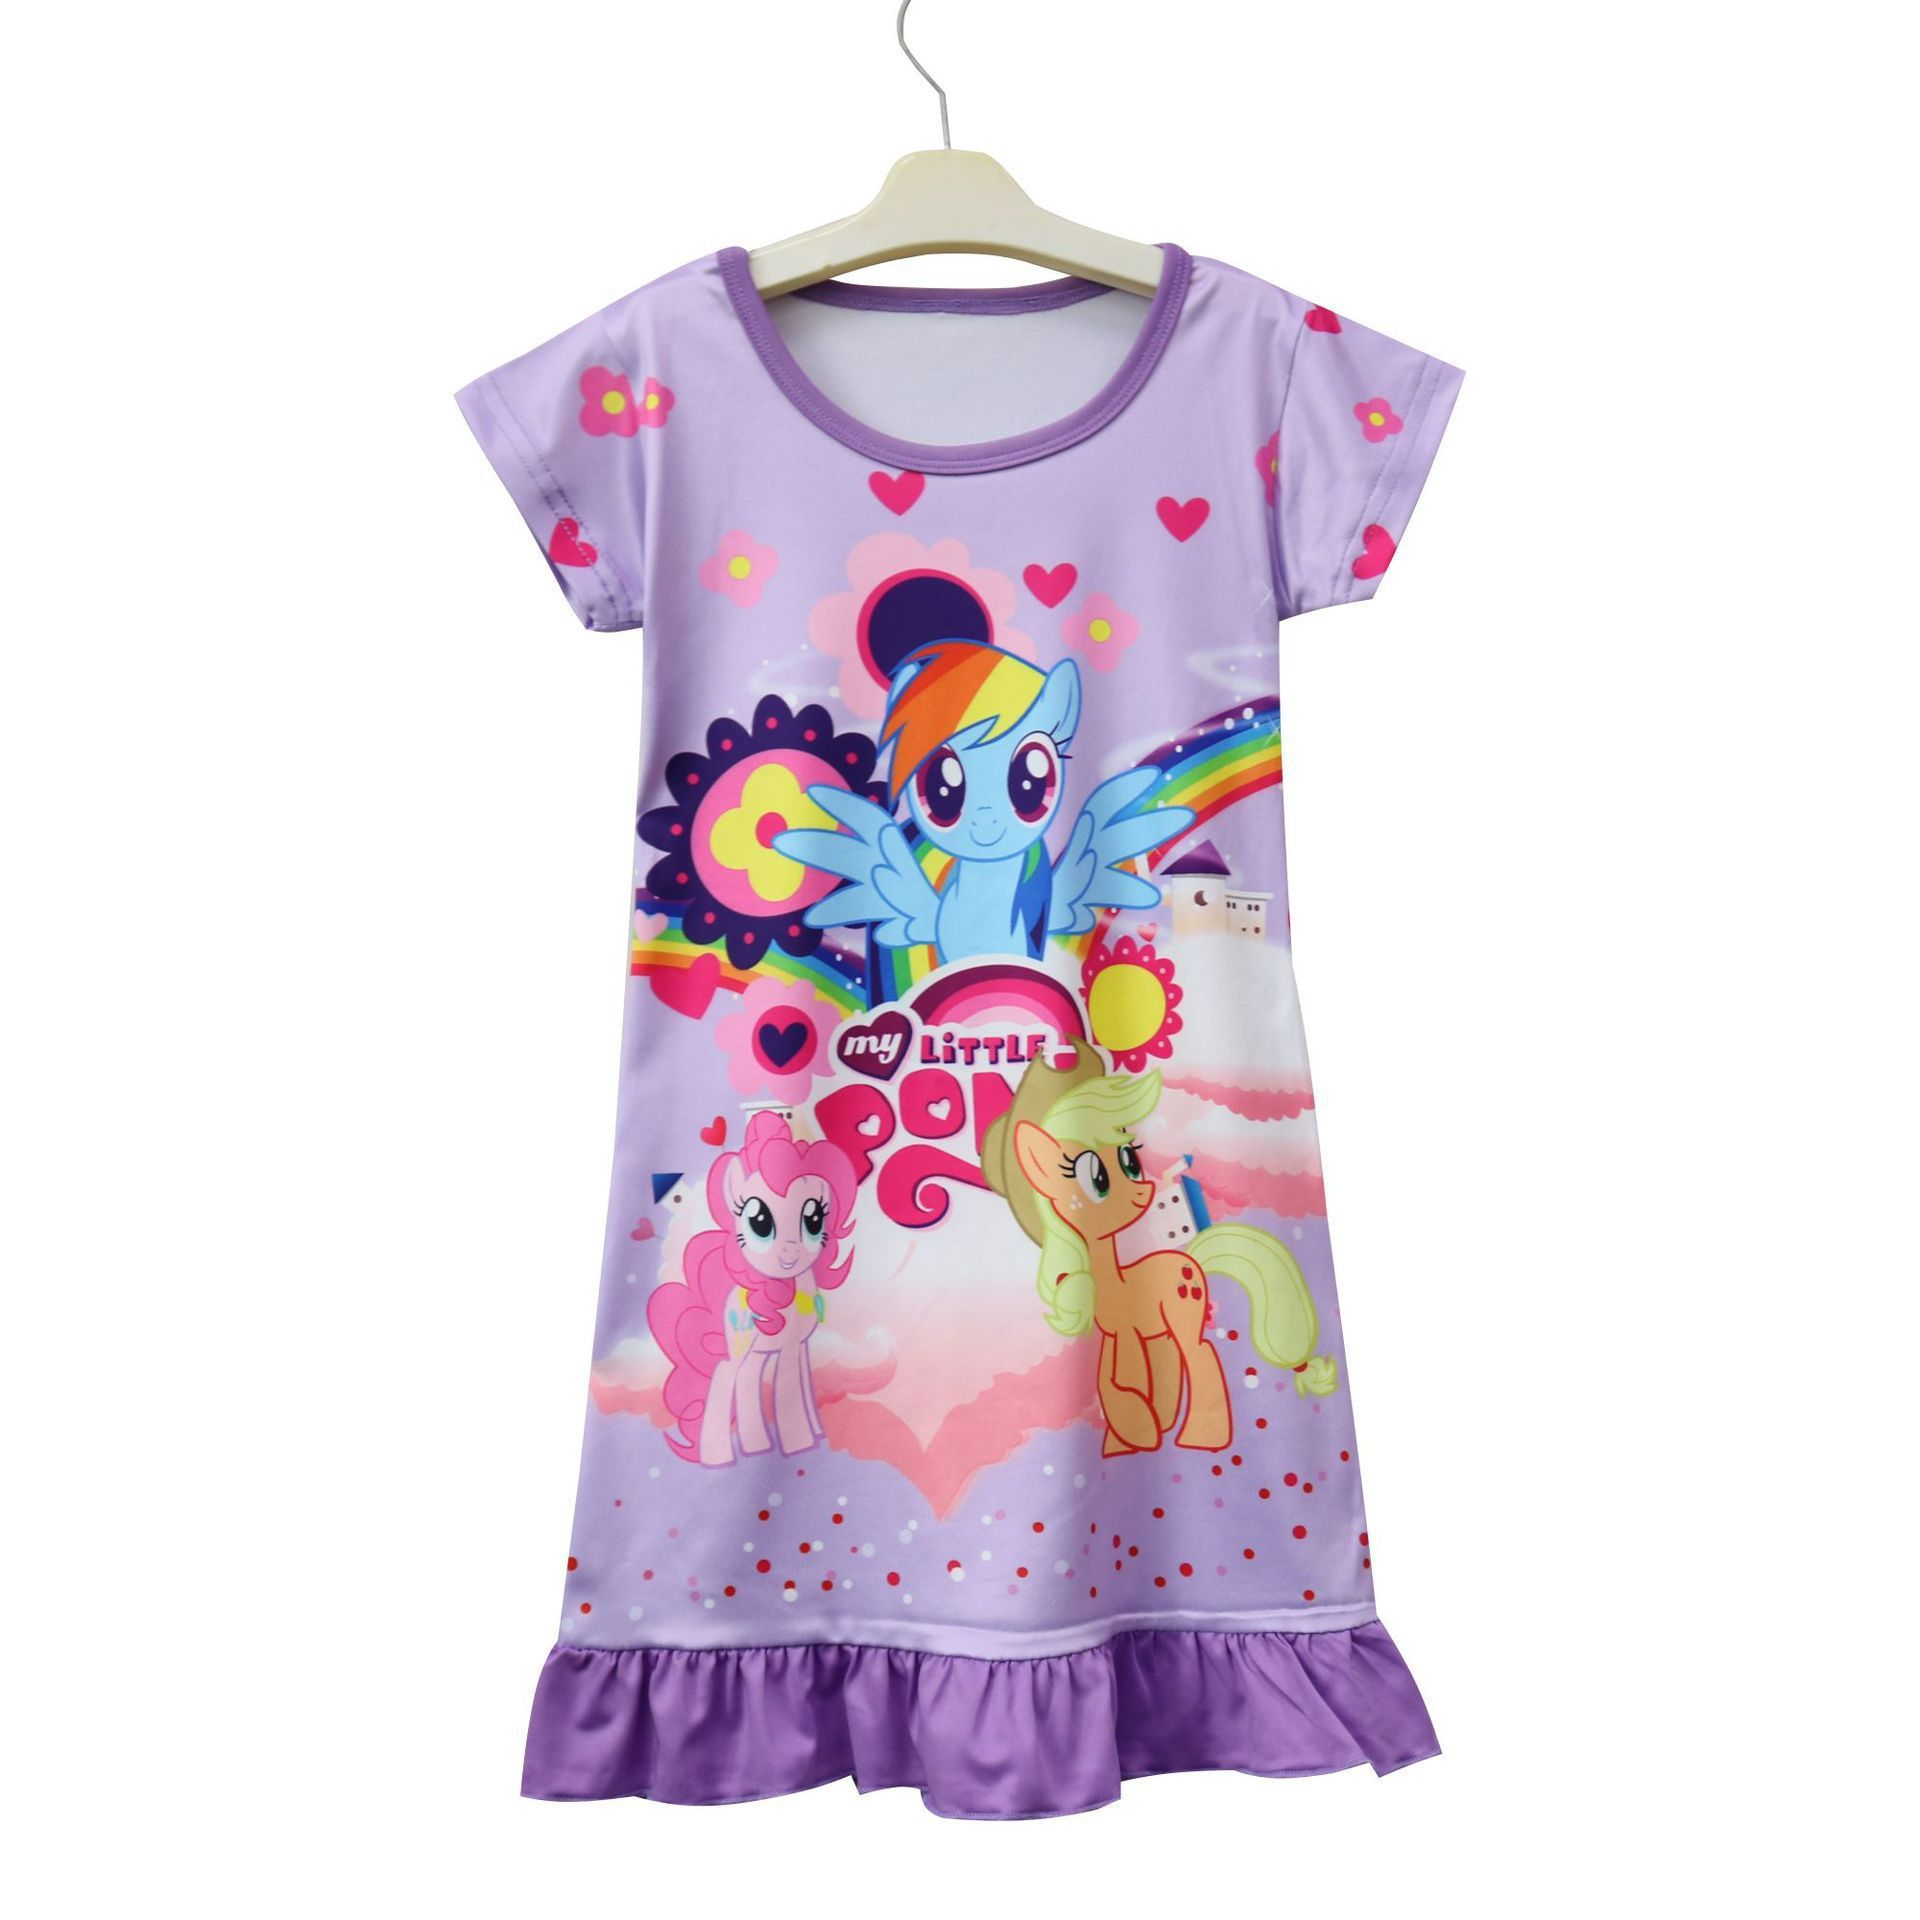 2018 summer cartoon My cute Girl Dress little ponys dresses Children Kids pajamas baby girls dresses Brand Girl Nightdress